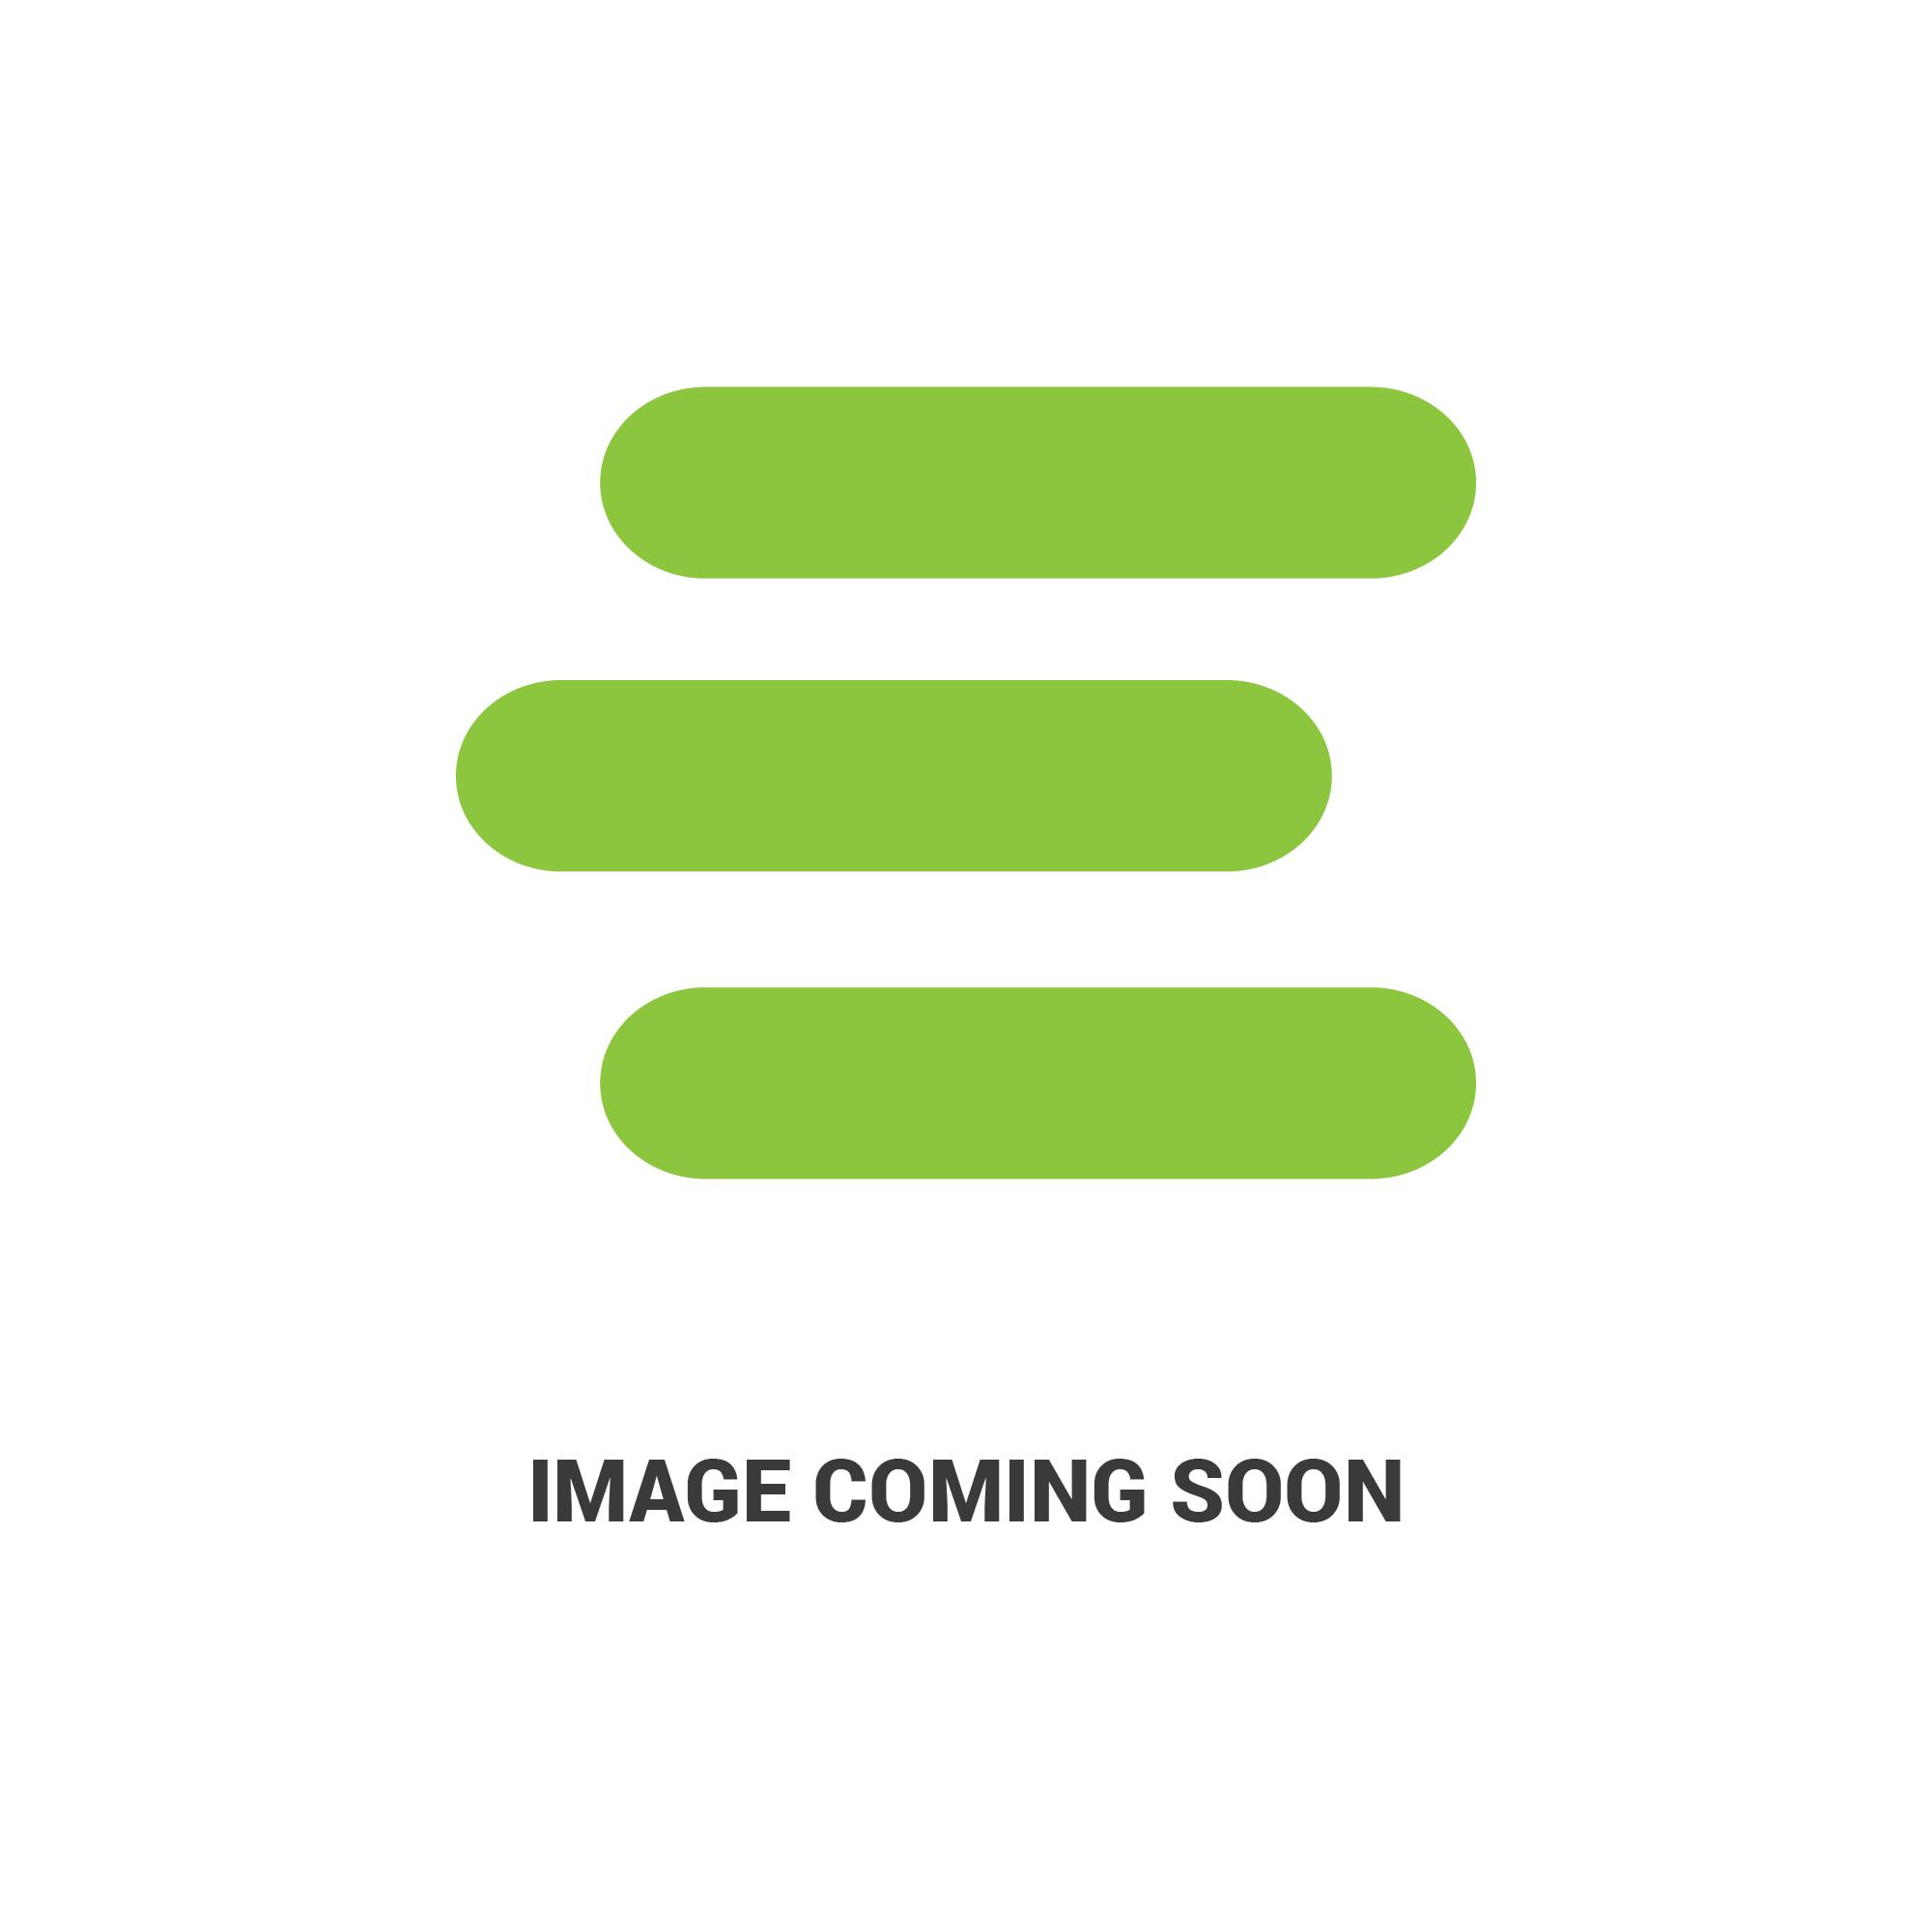 E-32330-39704edit 1.jpg